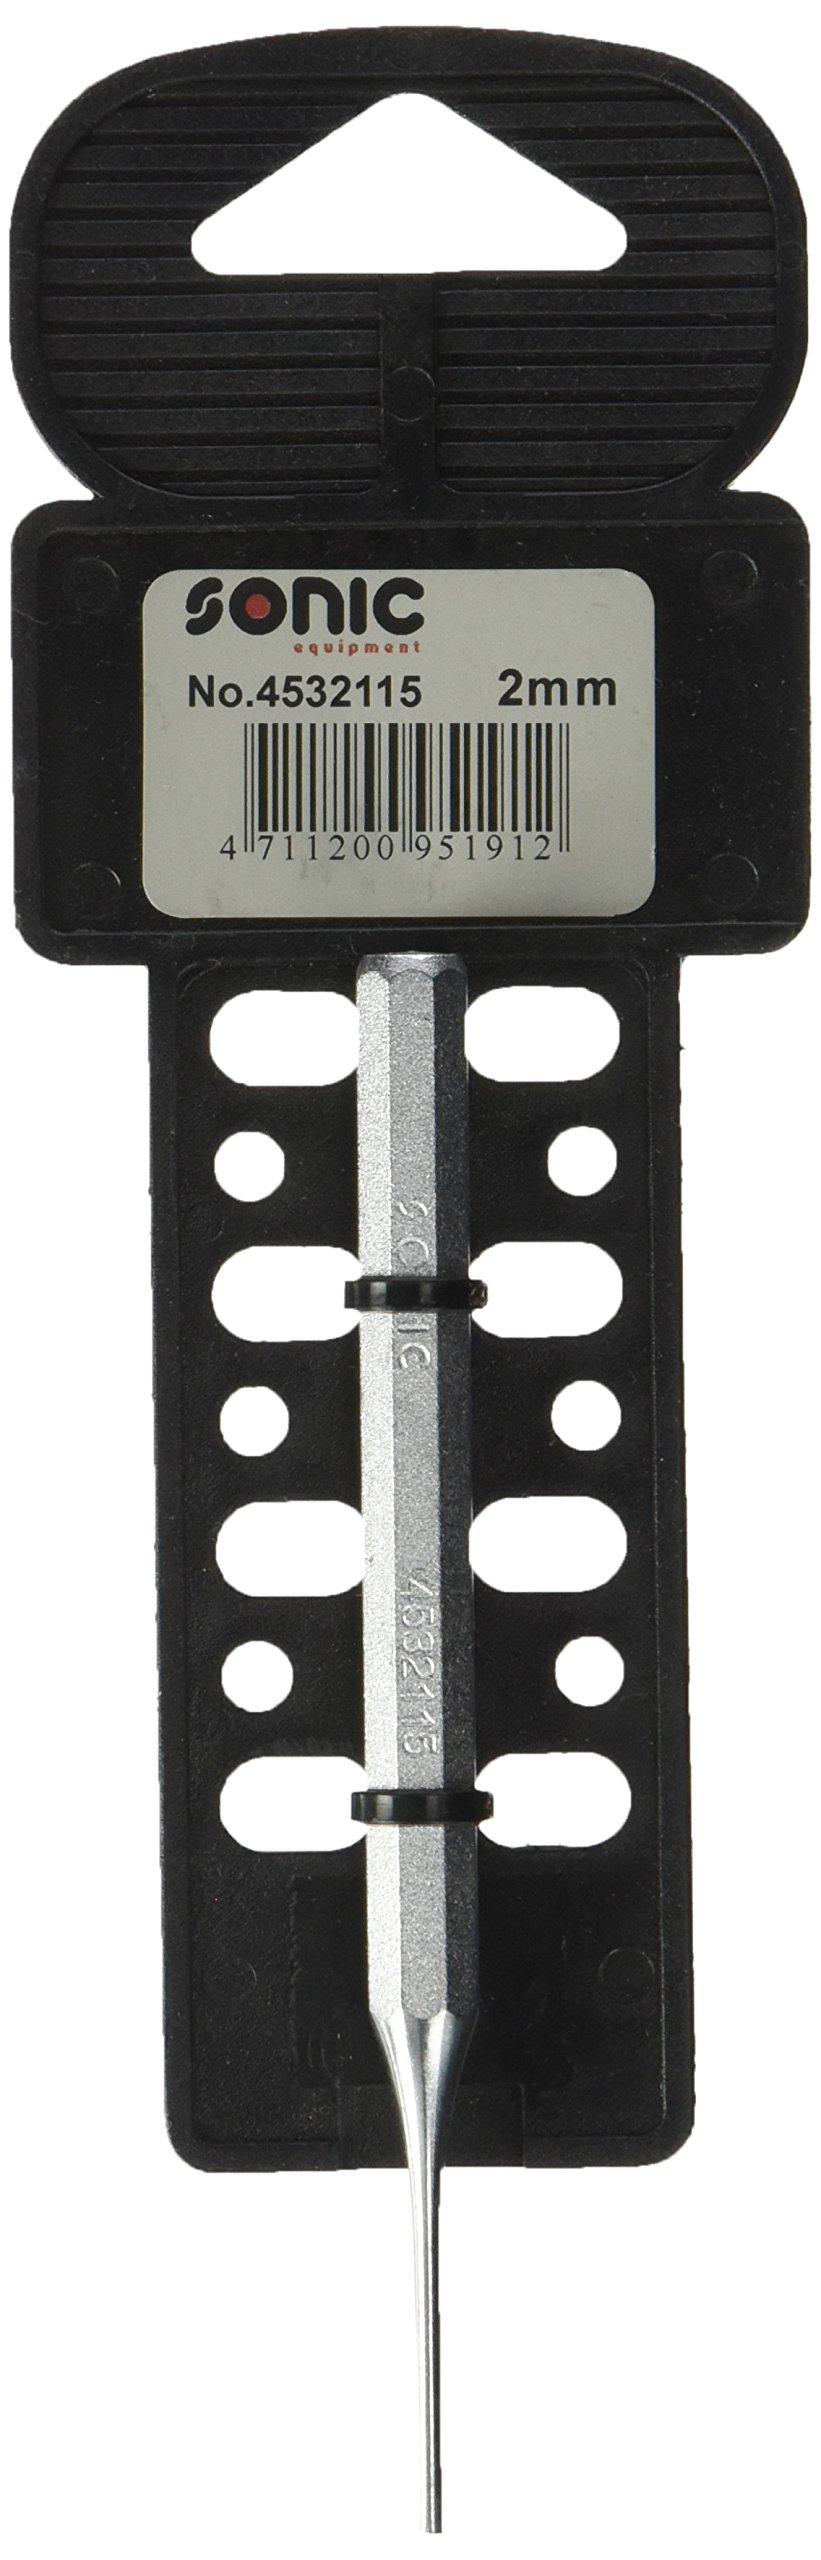 Sonic 4532115 Pin Punch, 115 MML, 2-inch